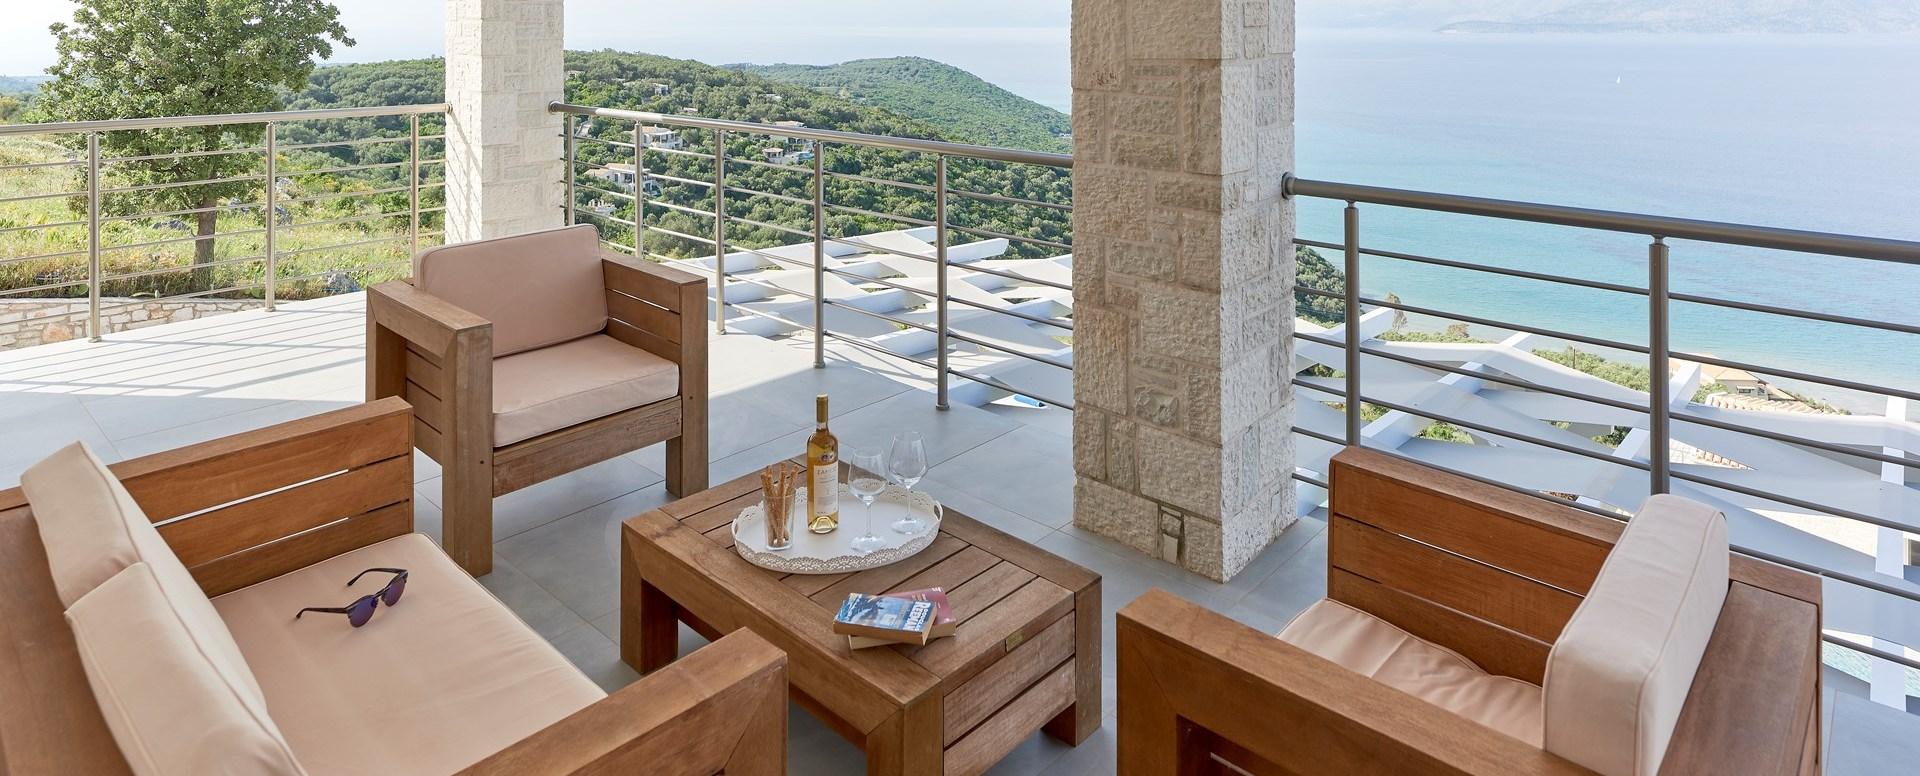 corfu-villa-bedroom-terrace